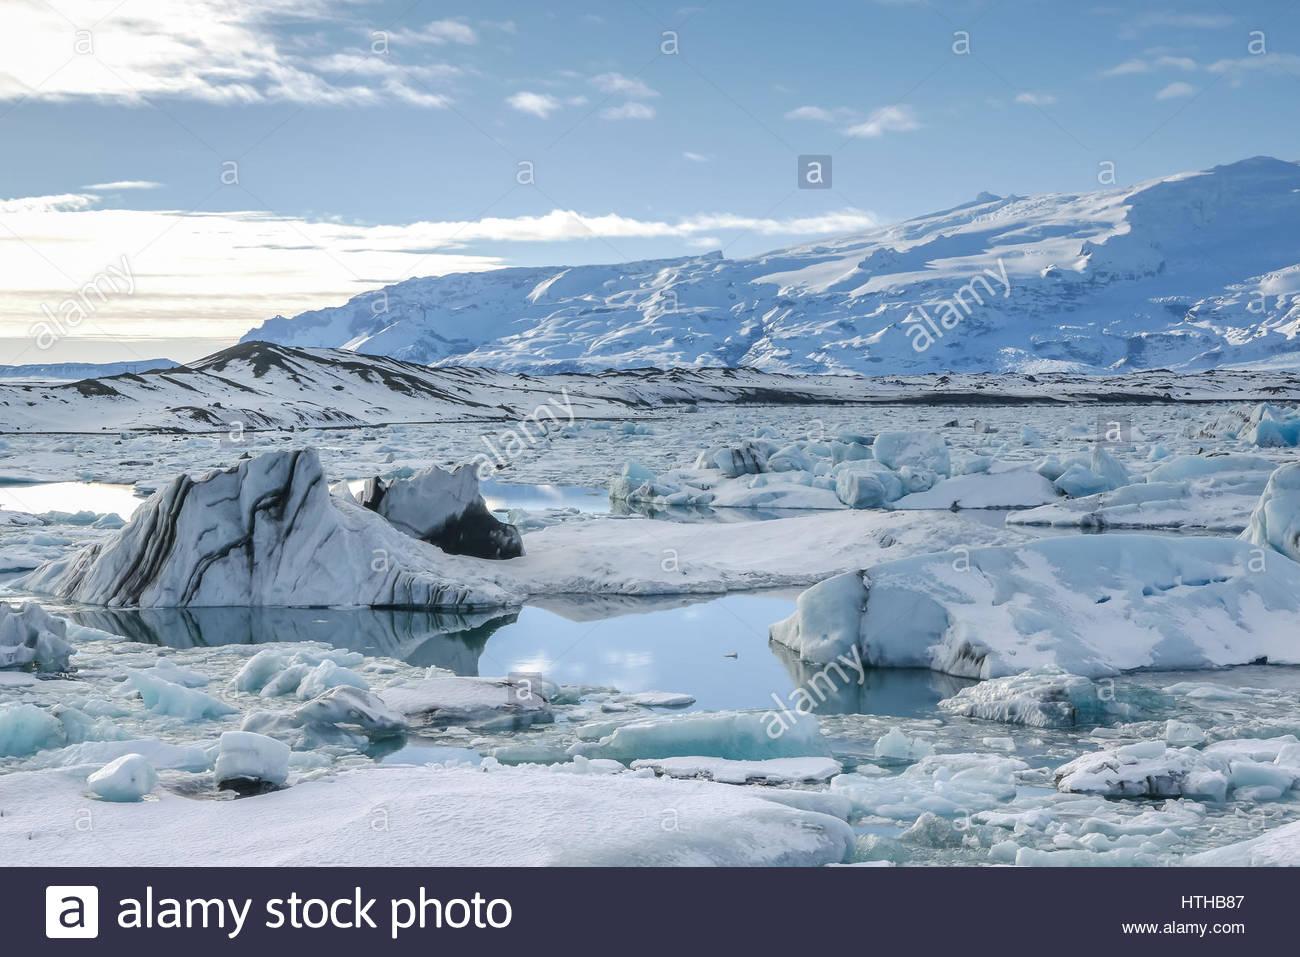 Icebergs at Jokulsarlon Glacier Lagoon, Iceland - Stock Image